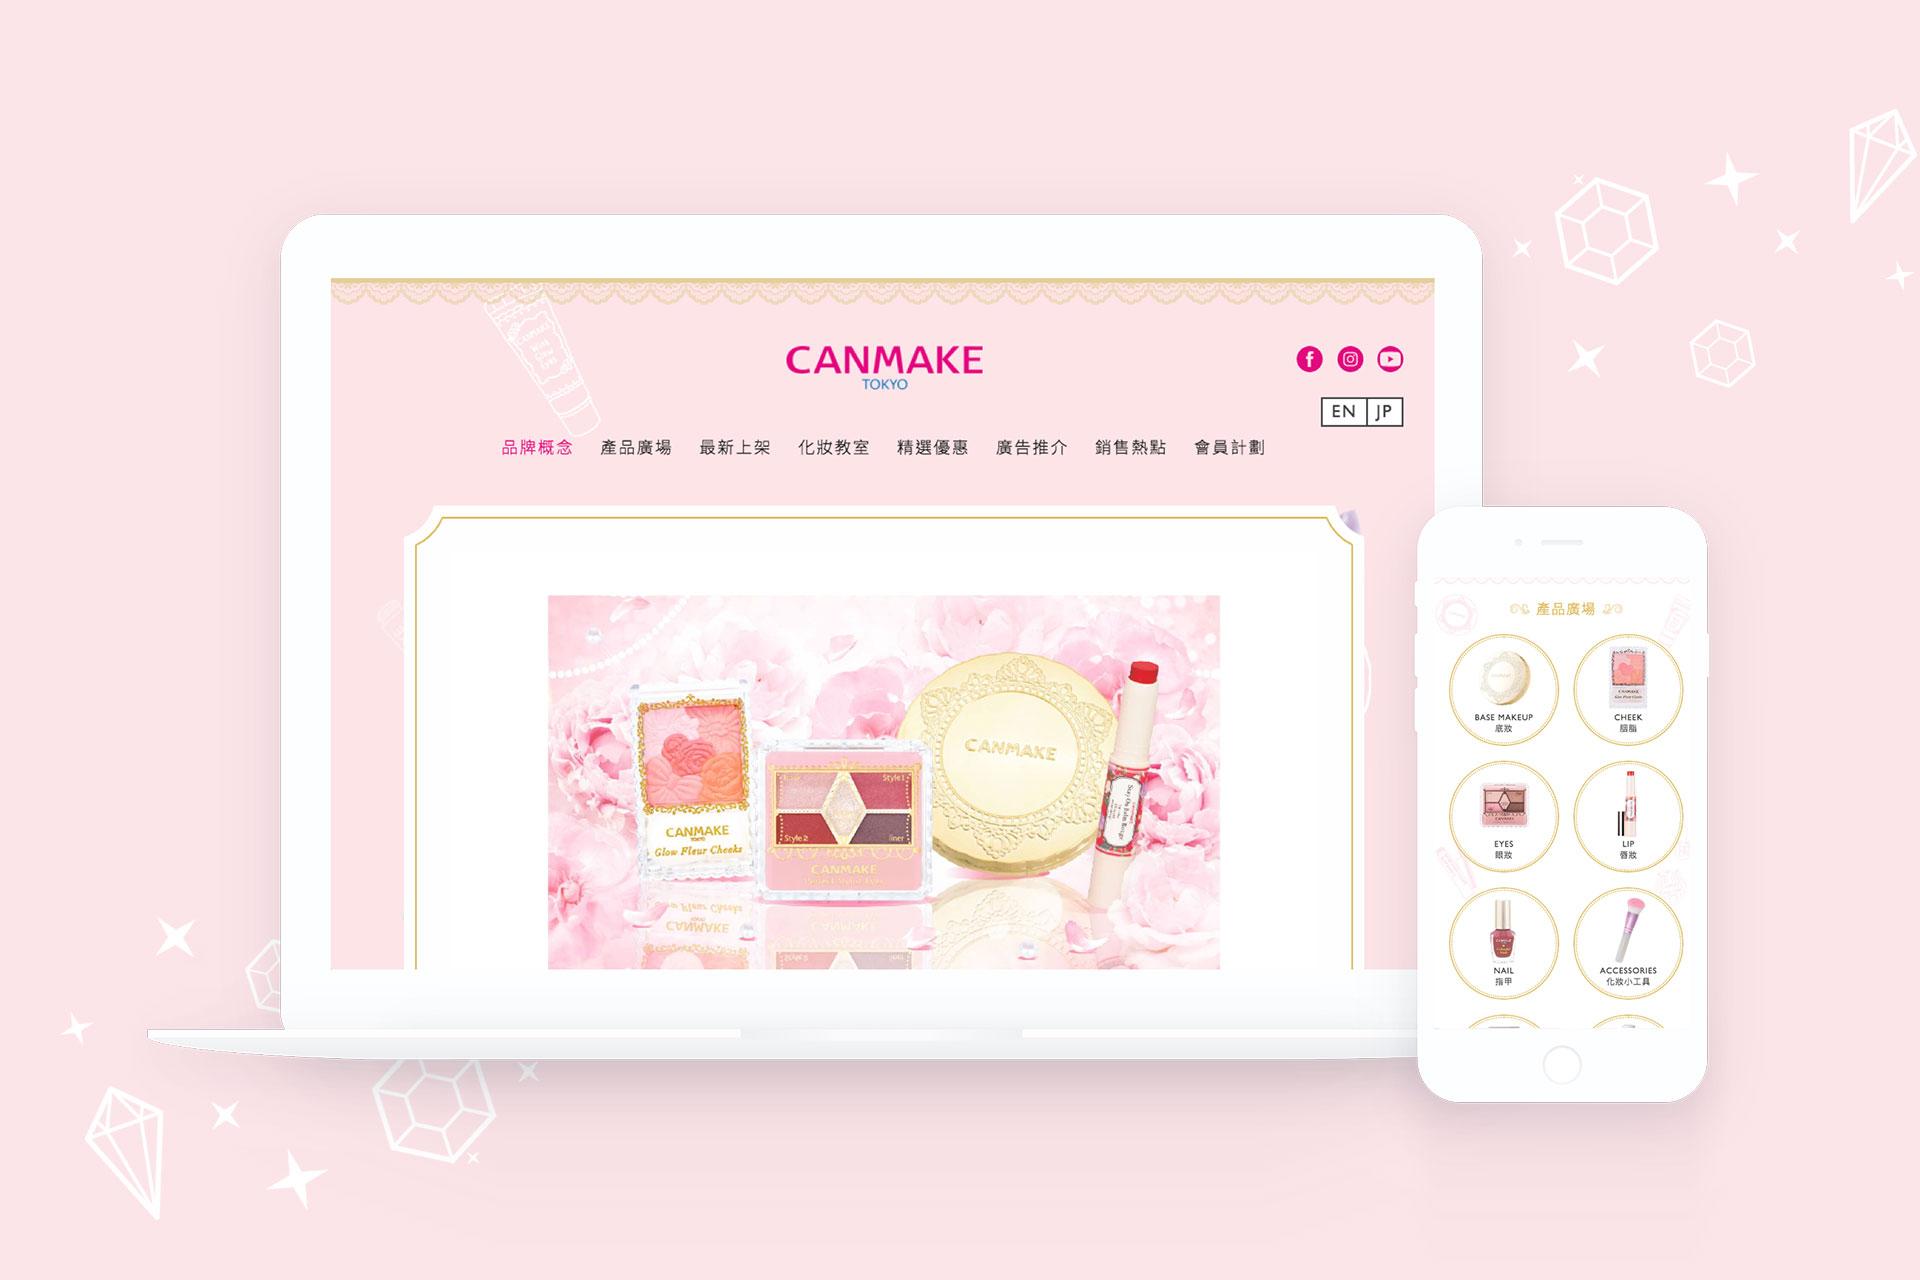 canmake-detailpage-01.jpg